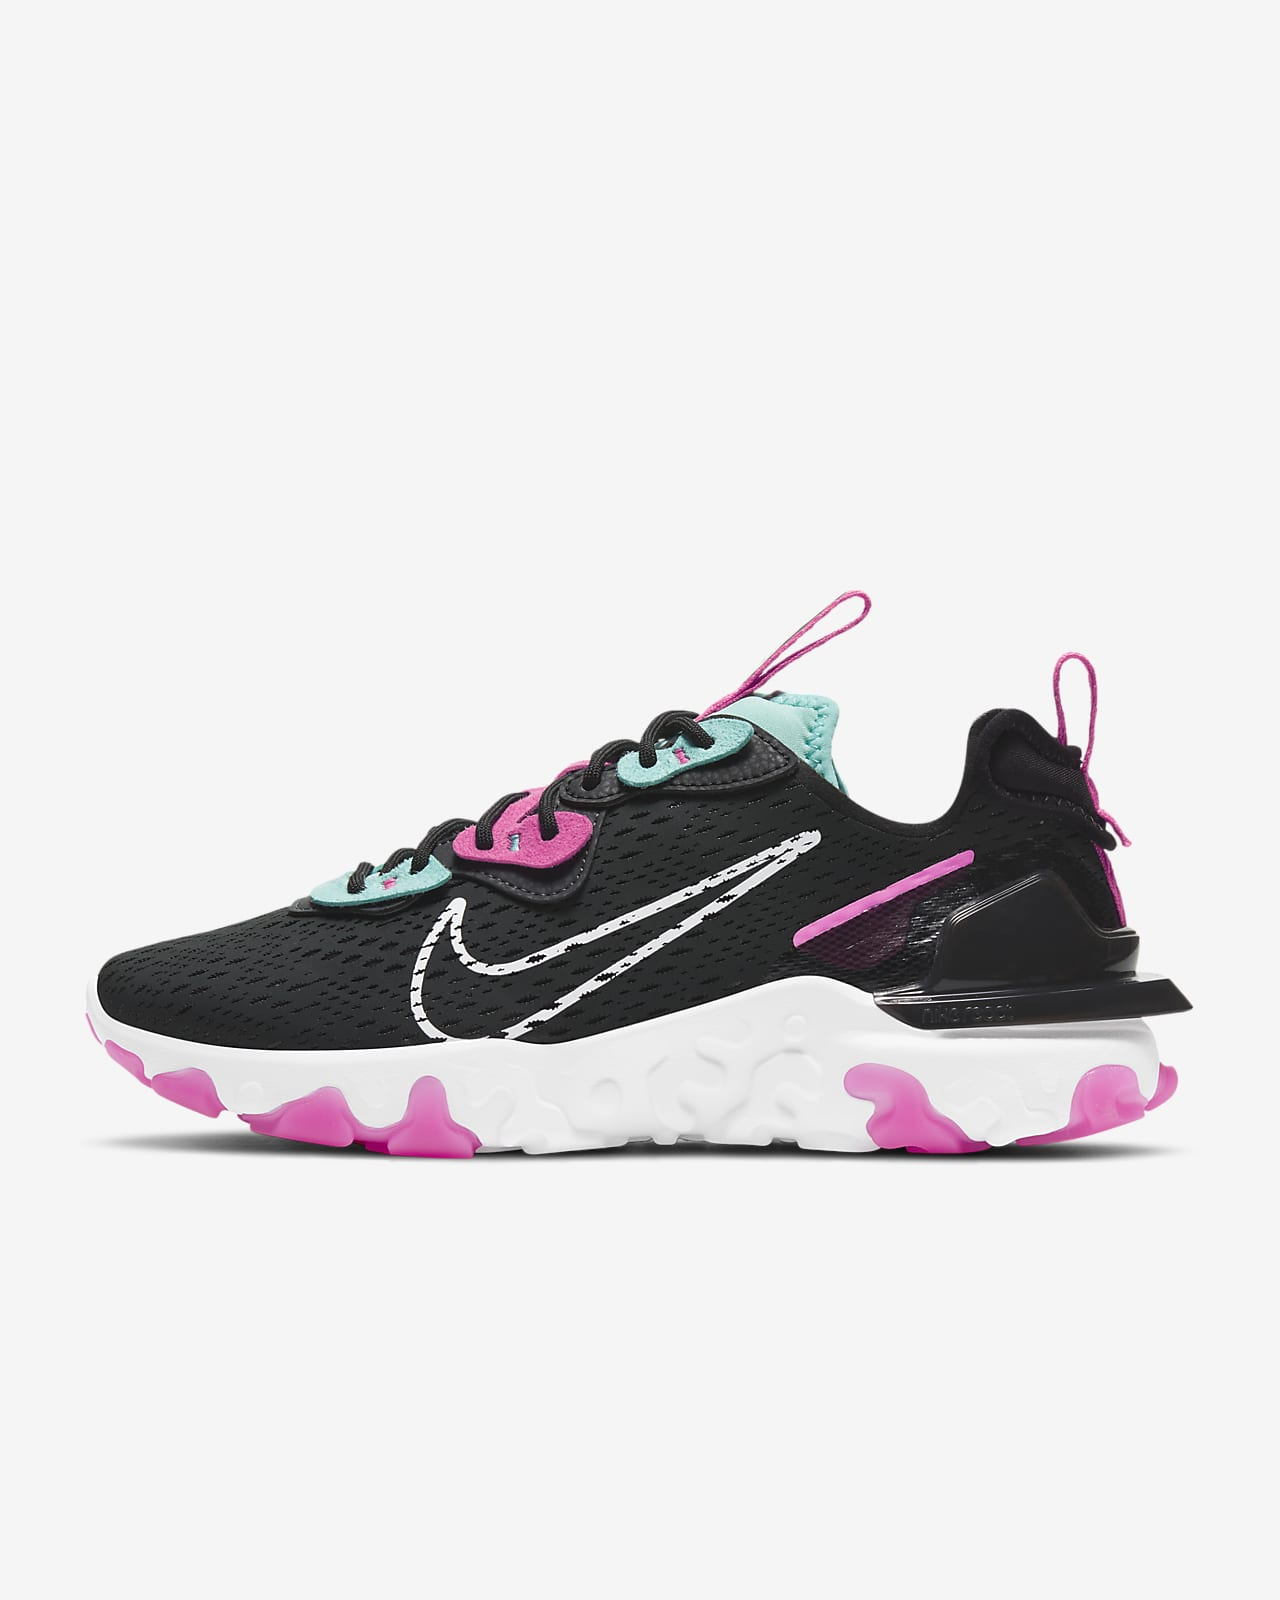 Nike React Vision Damenschuh